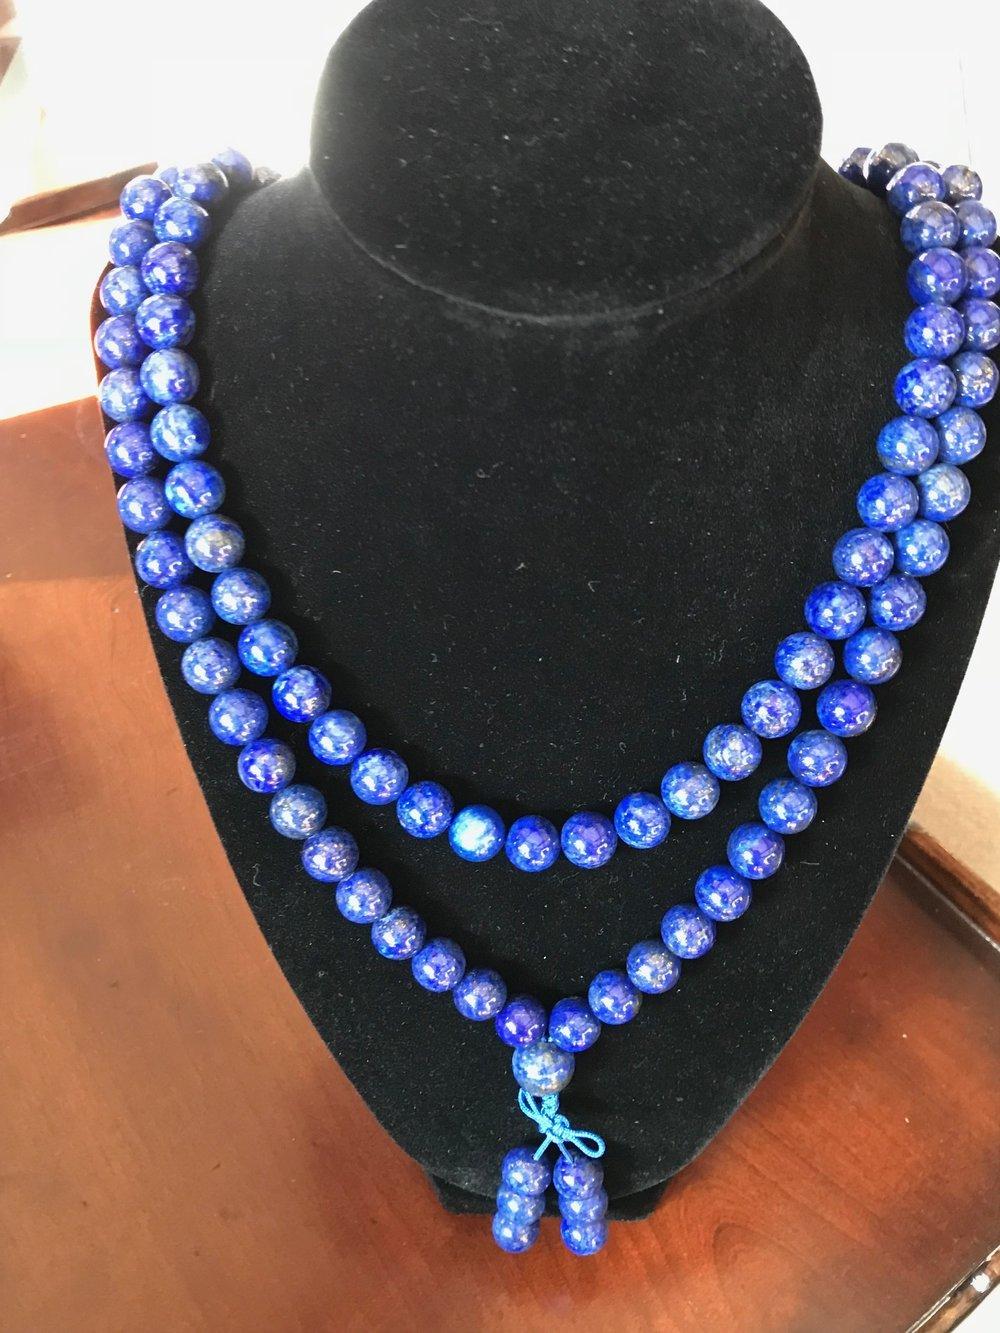 Lapis Lazuli mala necklace, 5mm stones